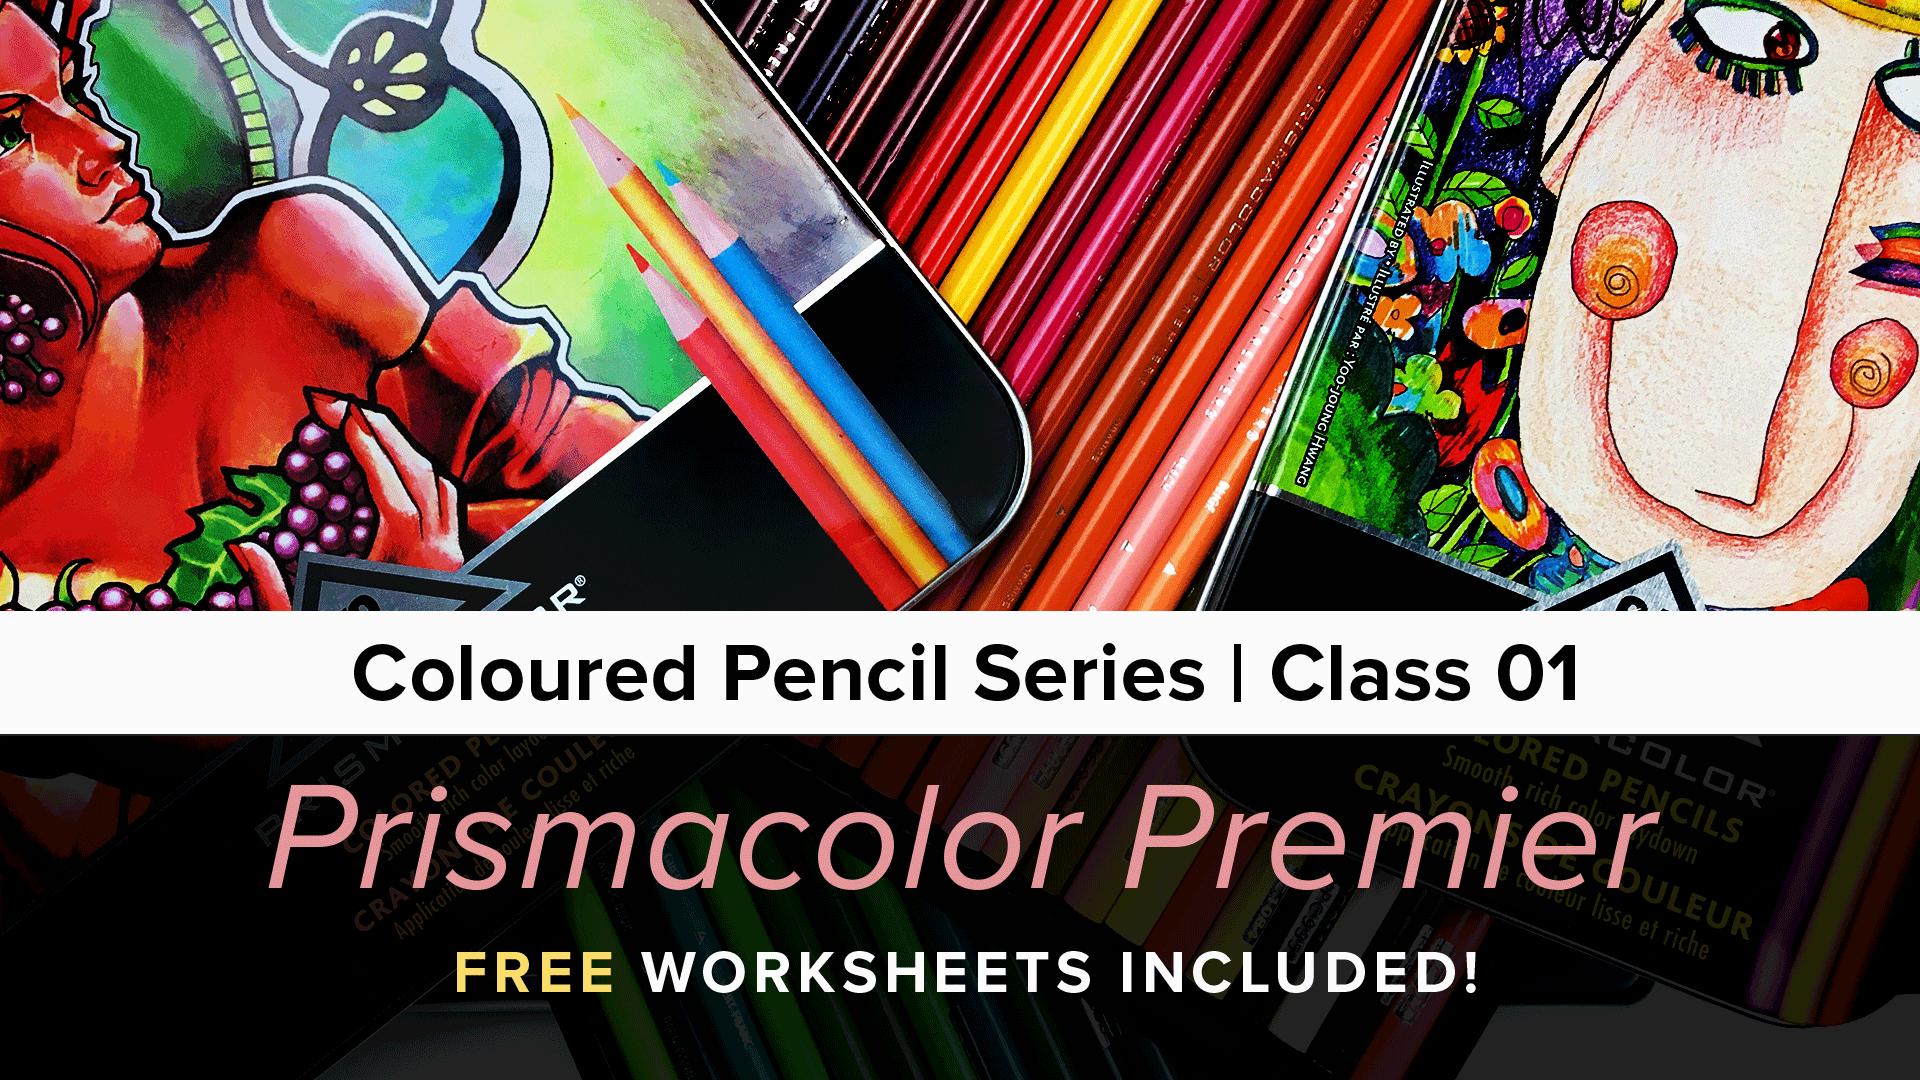 Coloured Pencil Series